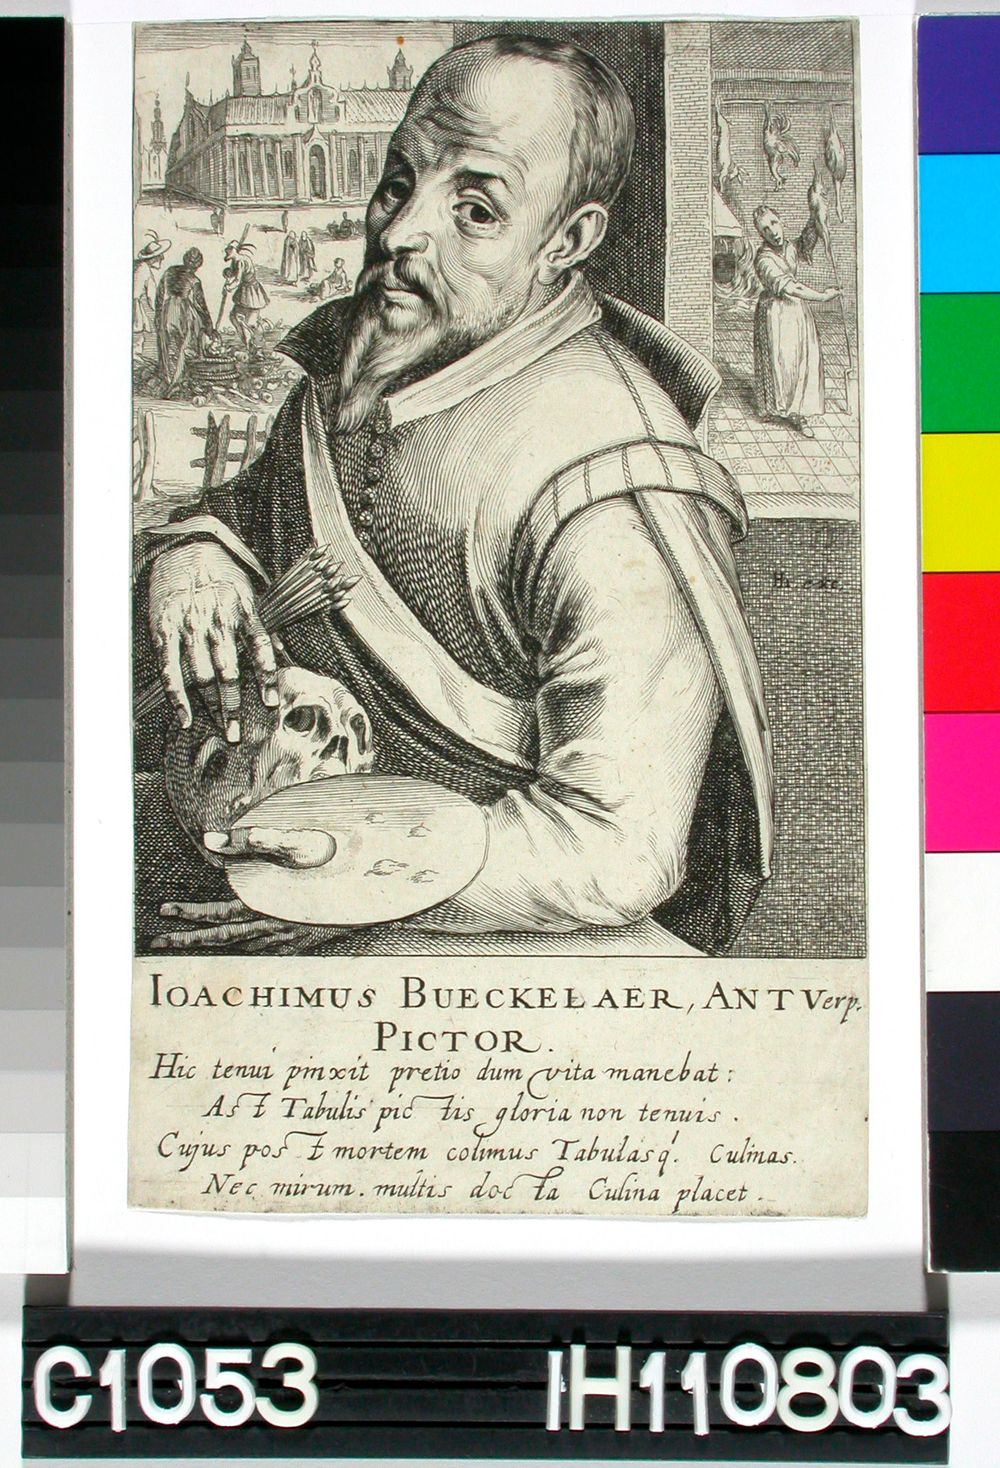 Joachim Bueckelaer